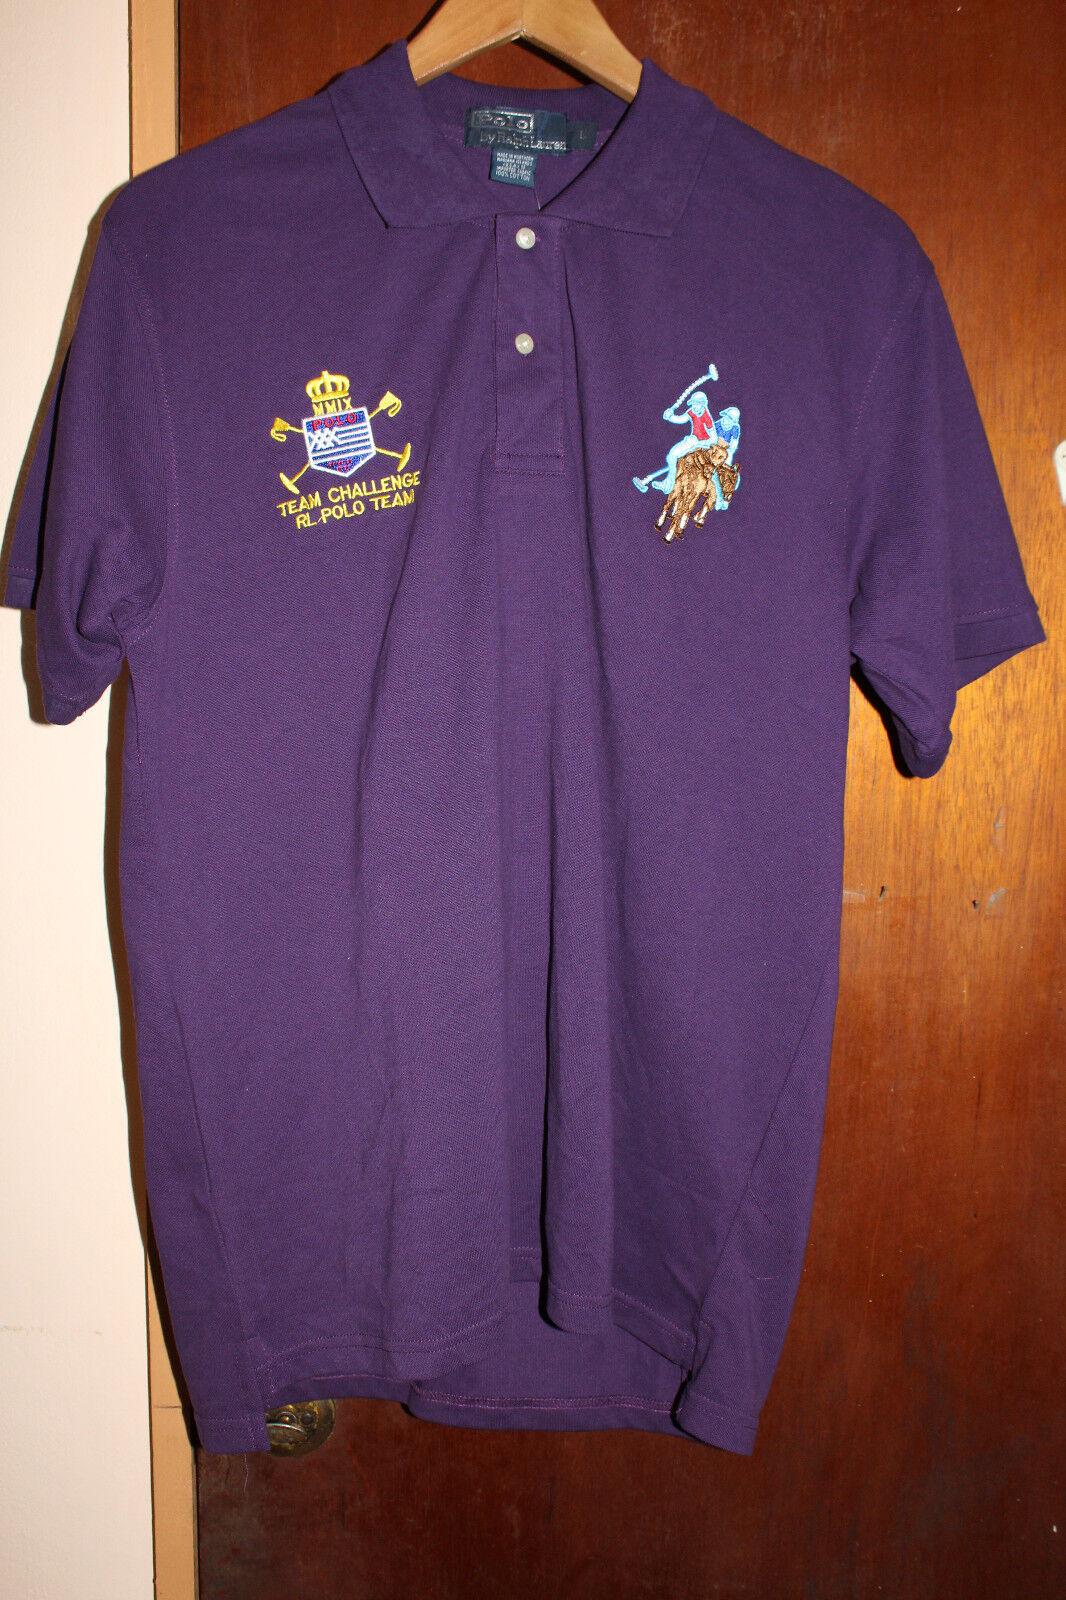 Polo Ralph Lauren Team Challenge RL Polo Team Men's Purple Polo Shirt Size Large